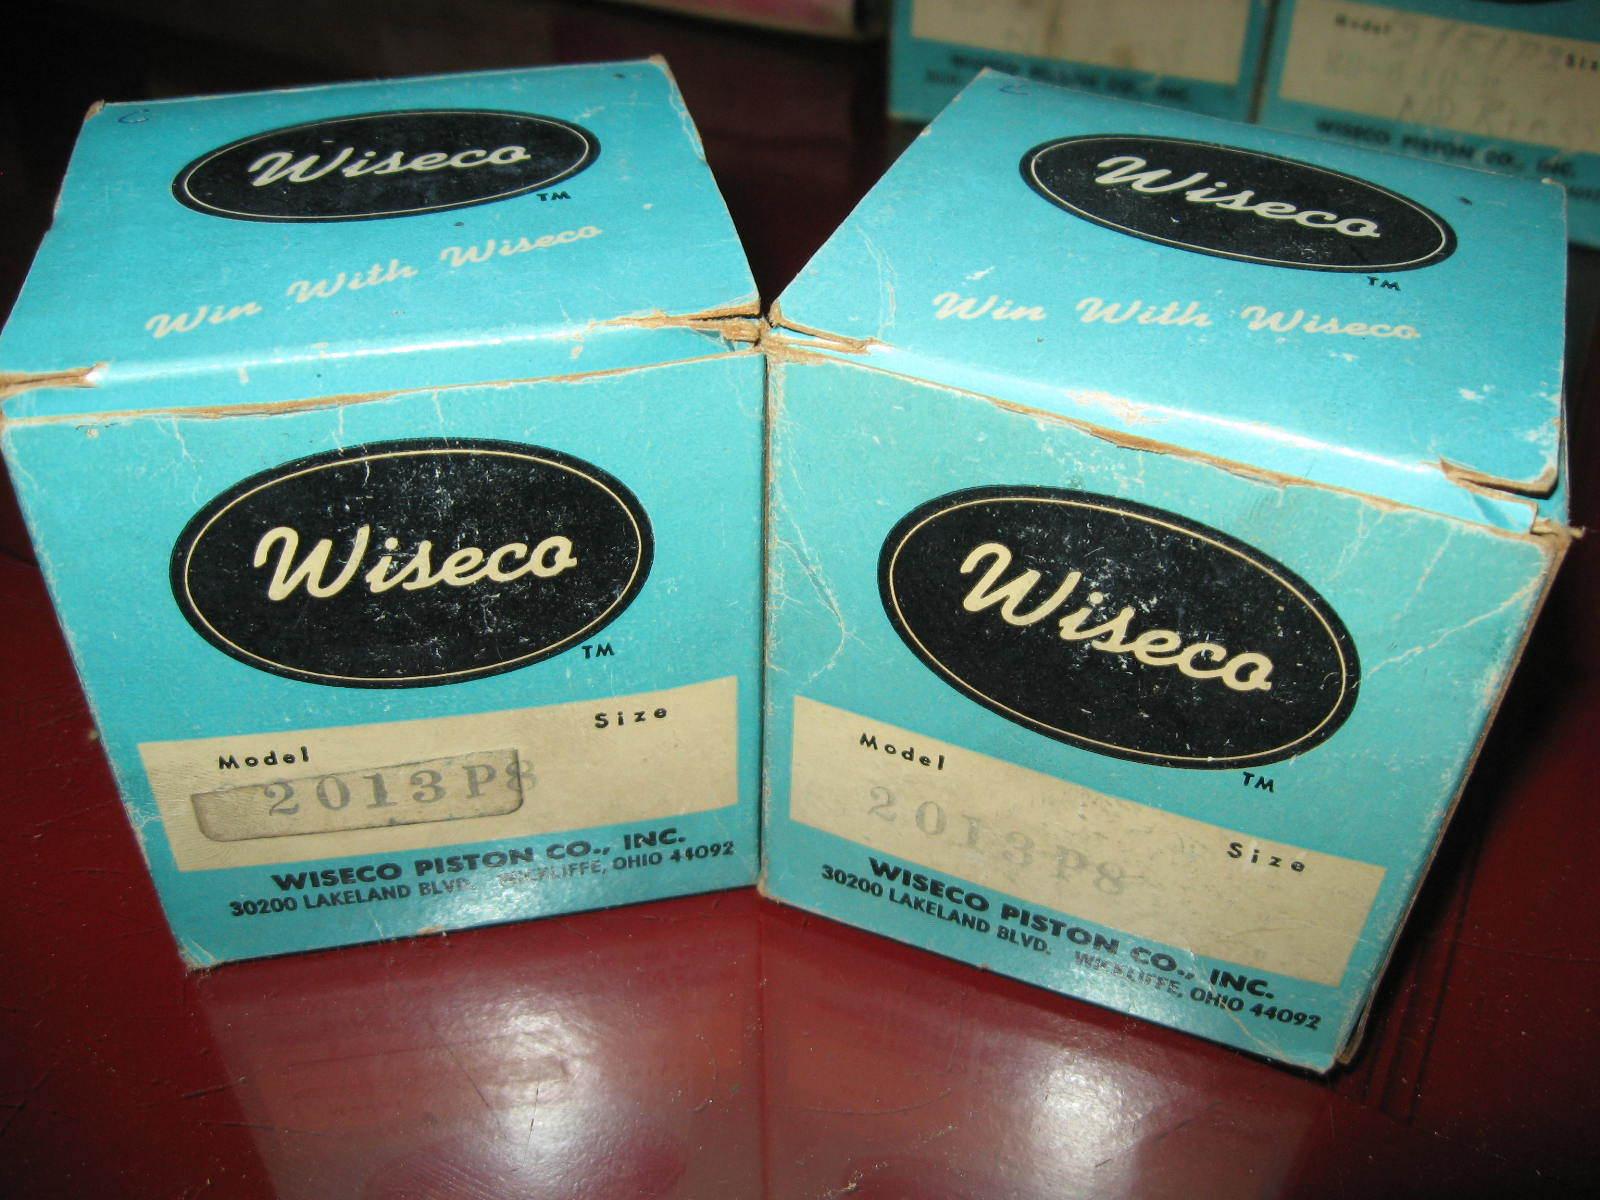 1971 1972 CCW Kioritz 400 2_3_4_21 Wiseco Piston Kits x2_2mm os_Mercury_Scorpion